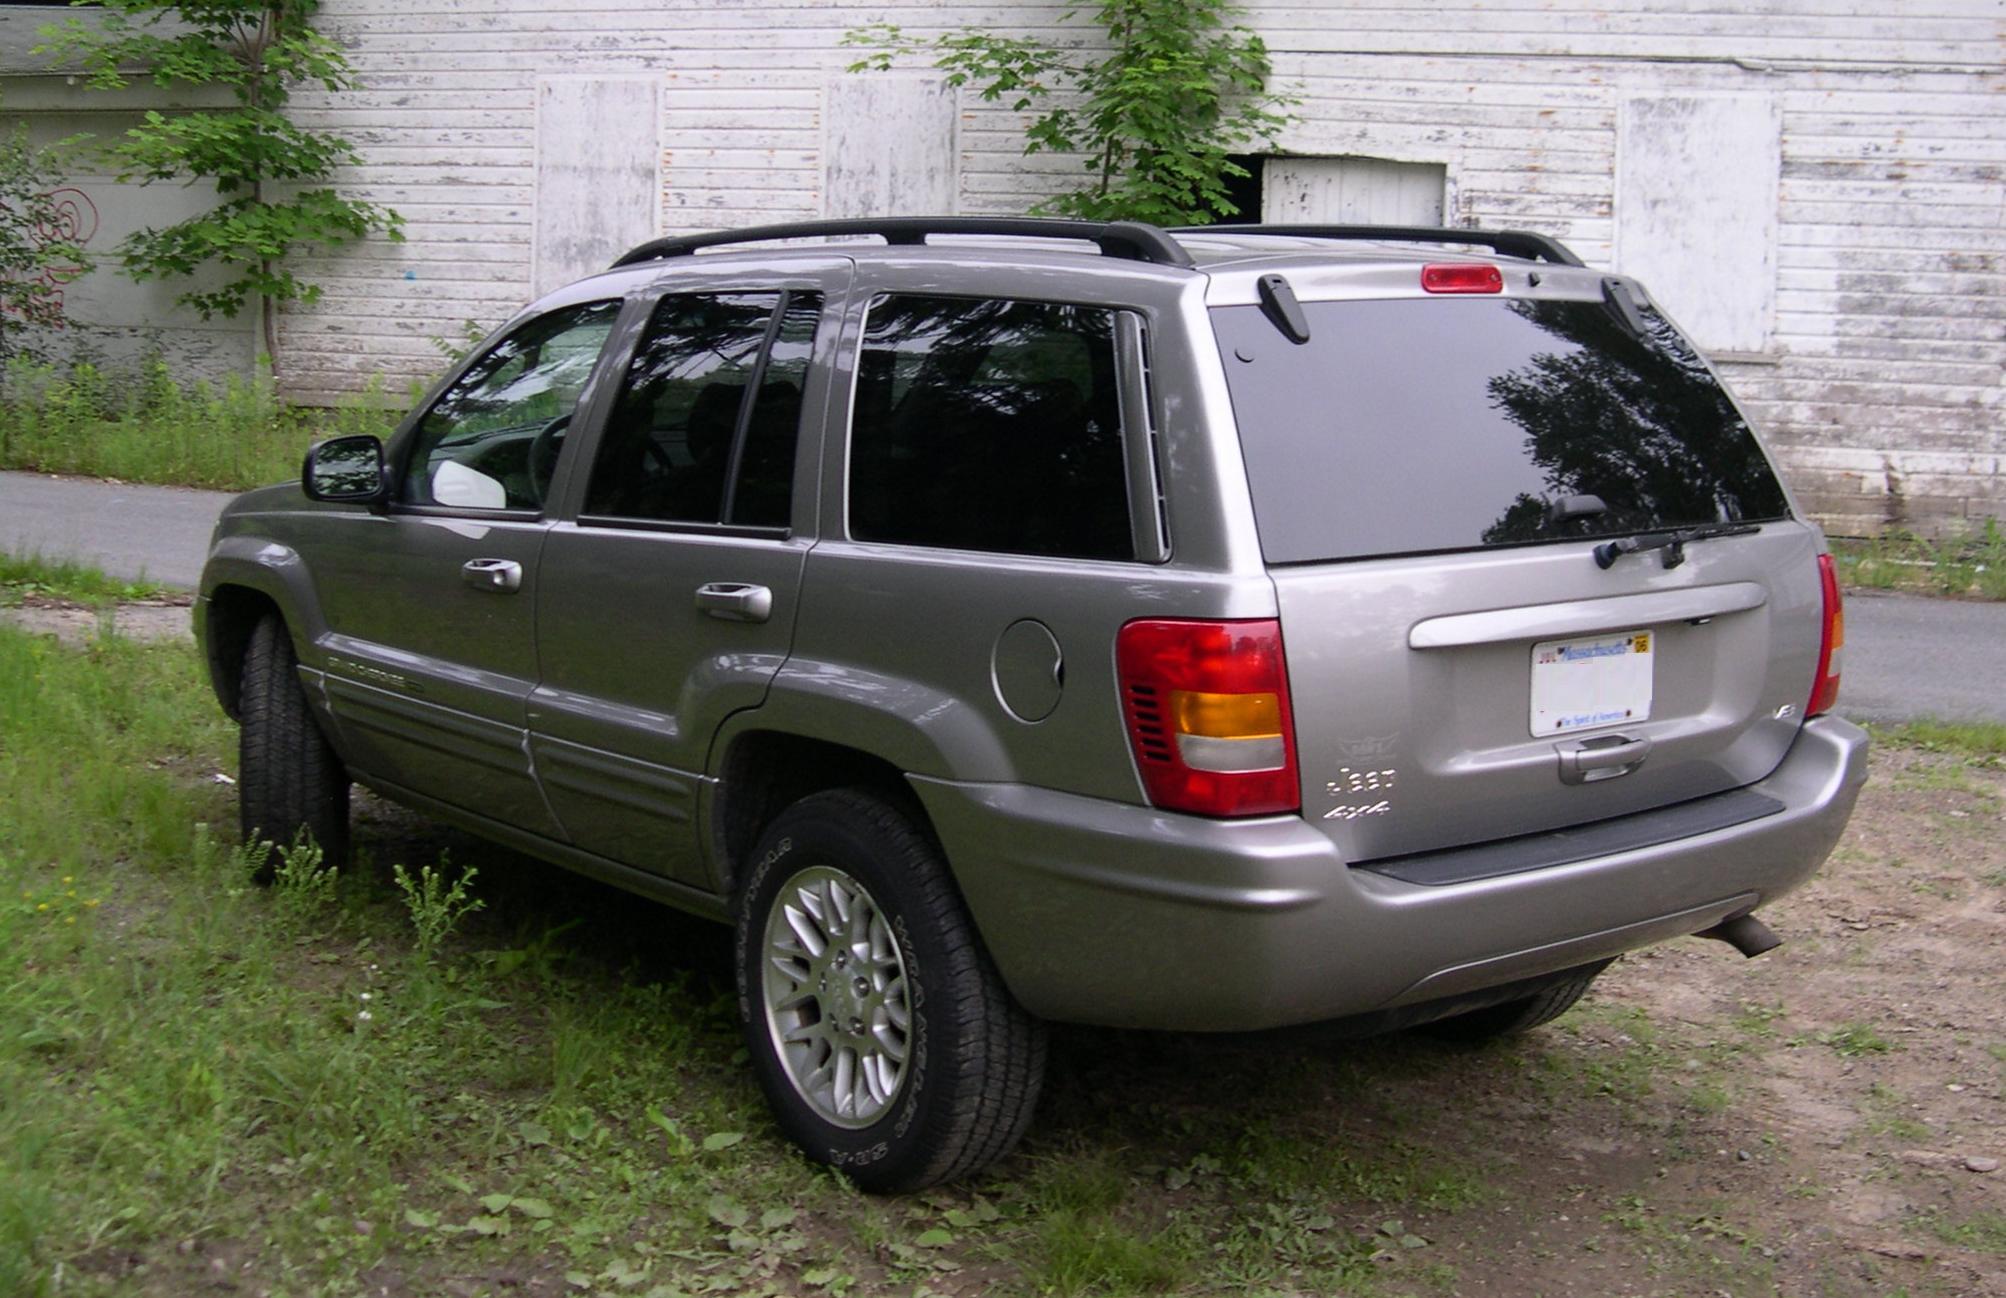 file:jeep grand cherokee wj rear 34 - wikimedia commons